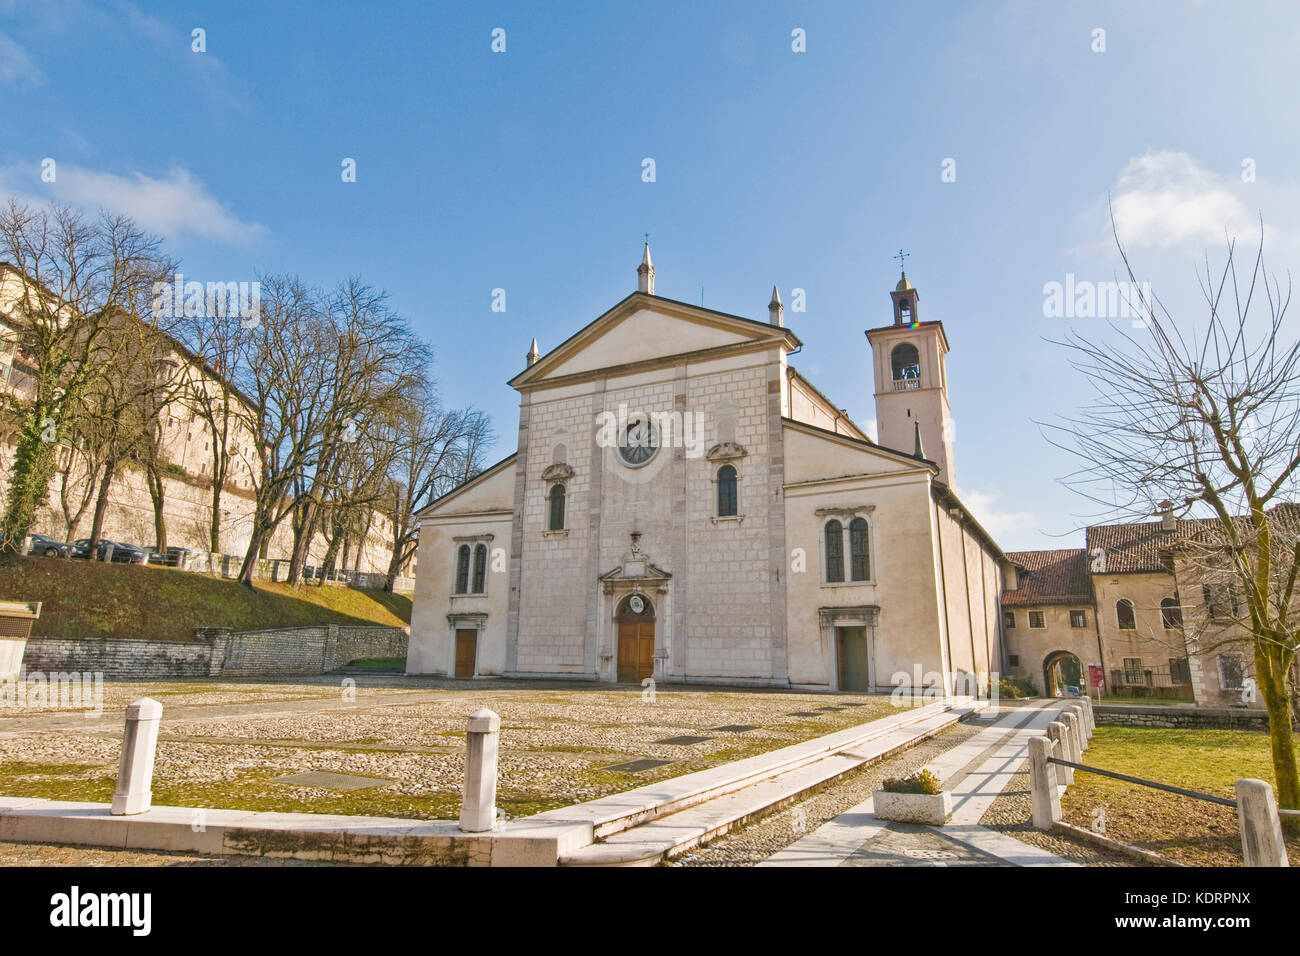 Cathedral, Feltre (Belluno, Italy) - Stock Image